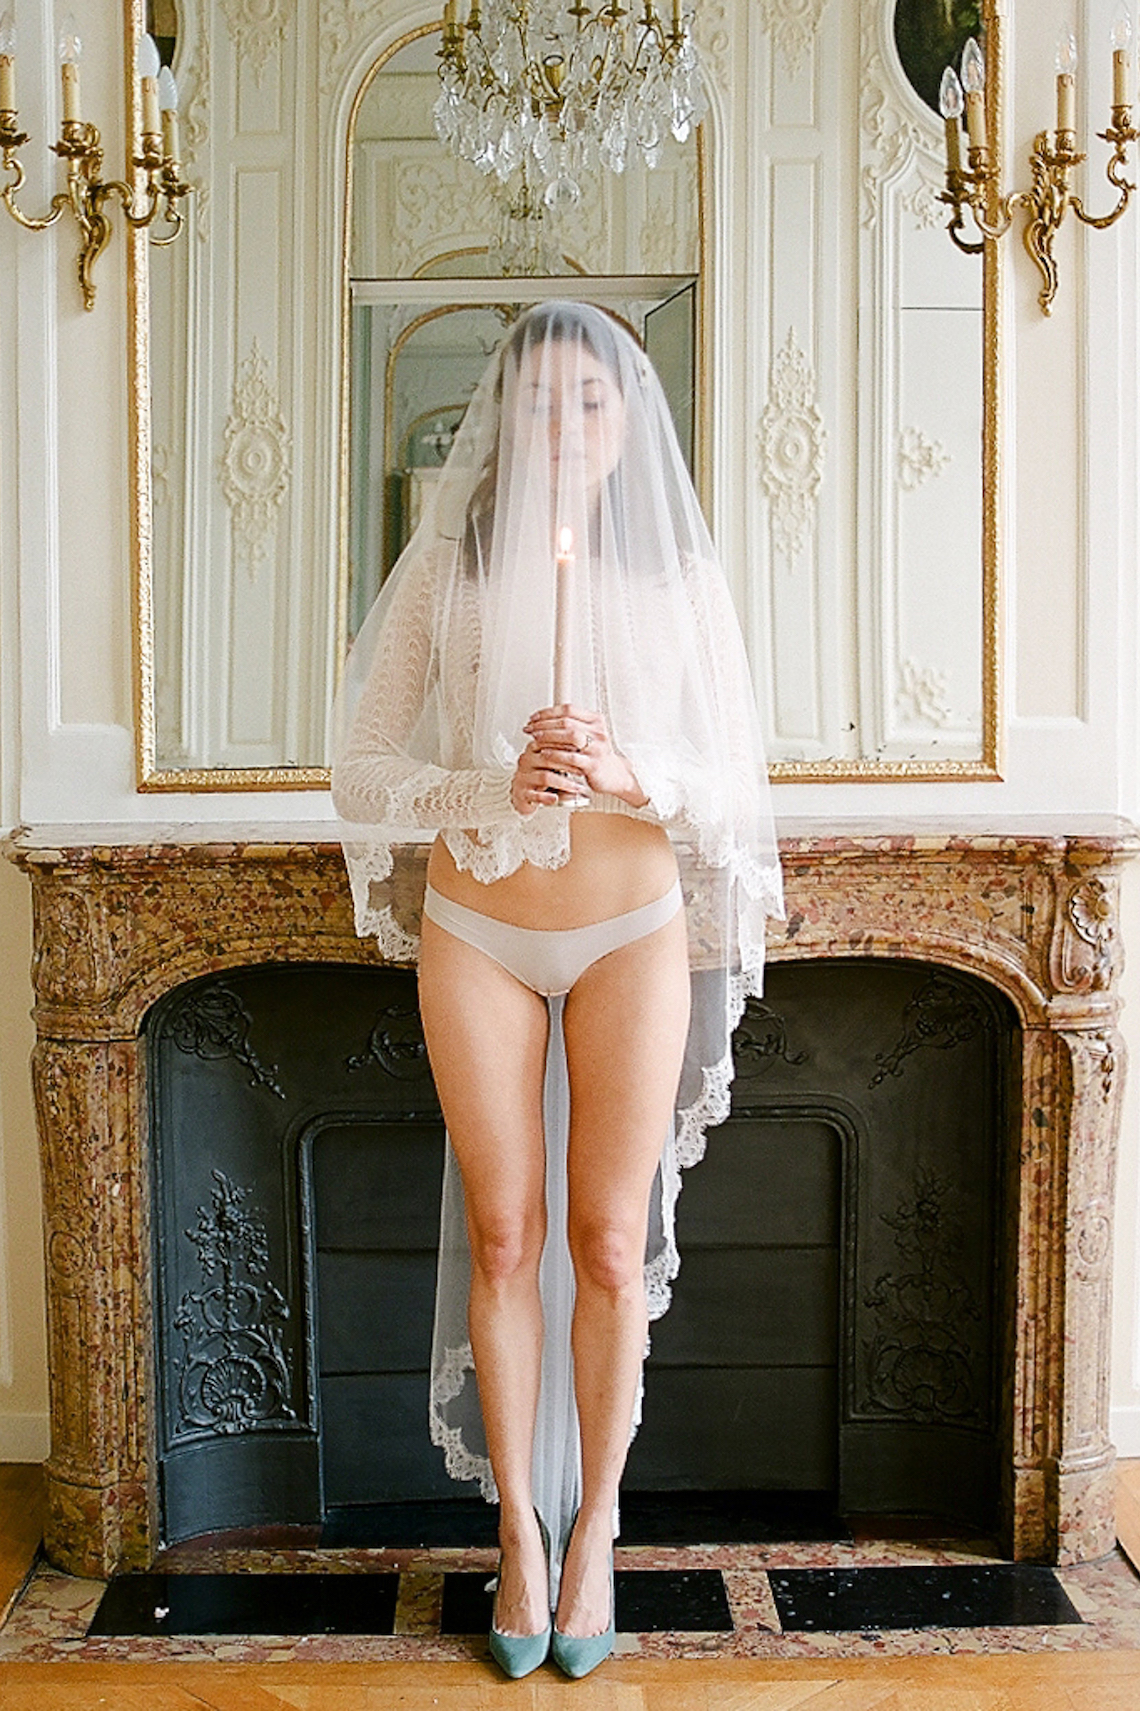 Panties Thru Dress